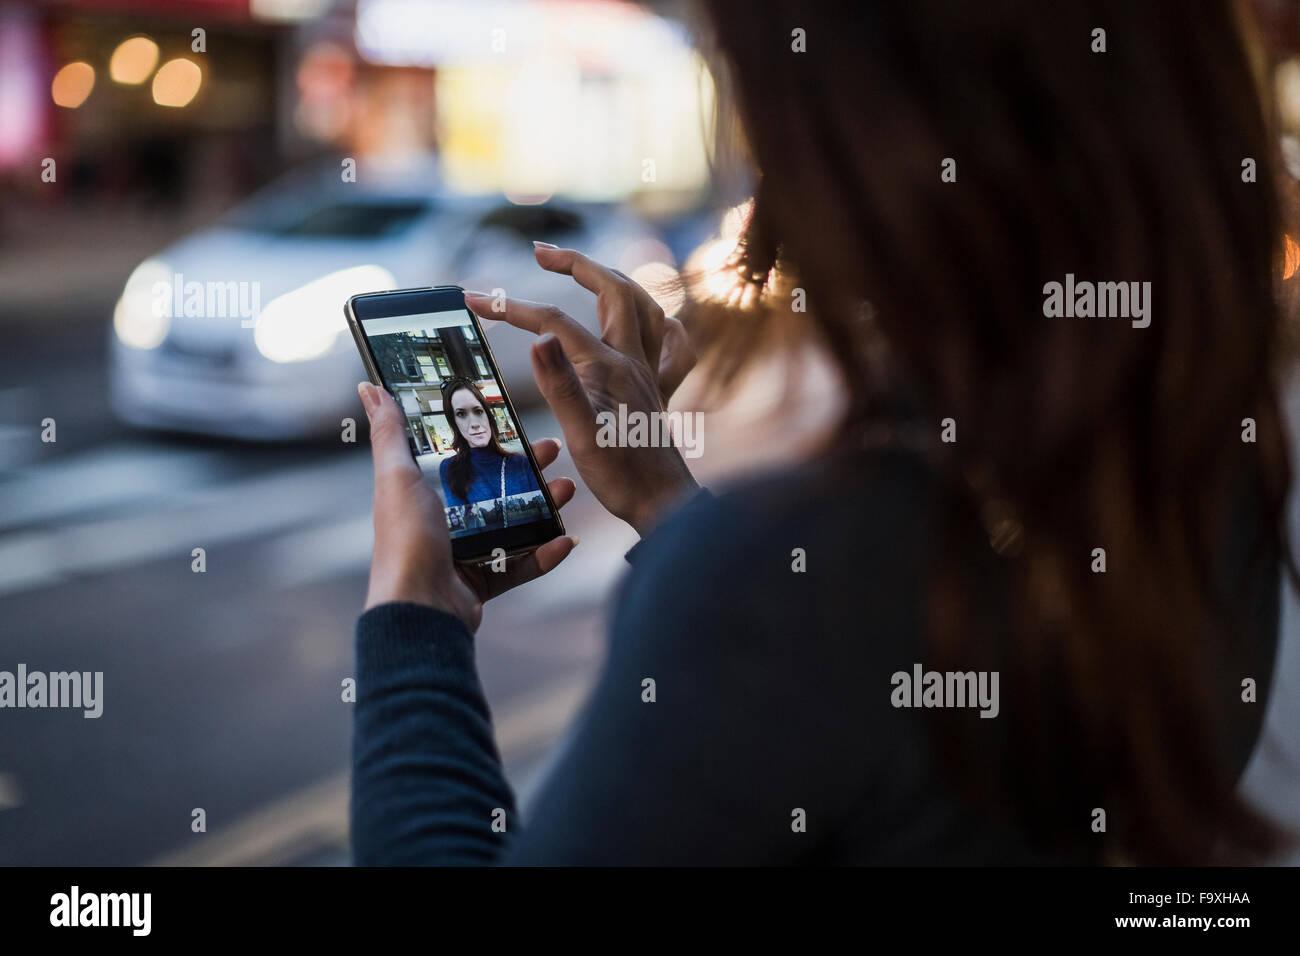 Woman taking a selfie by the roadside - Stock Image